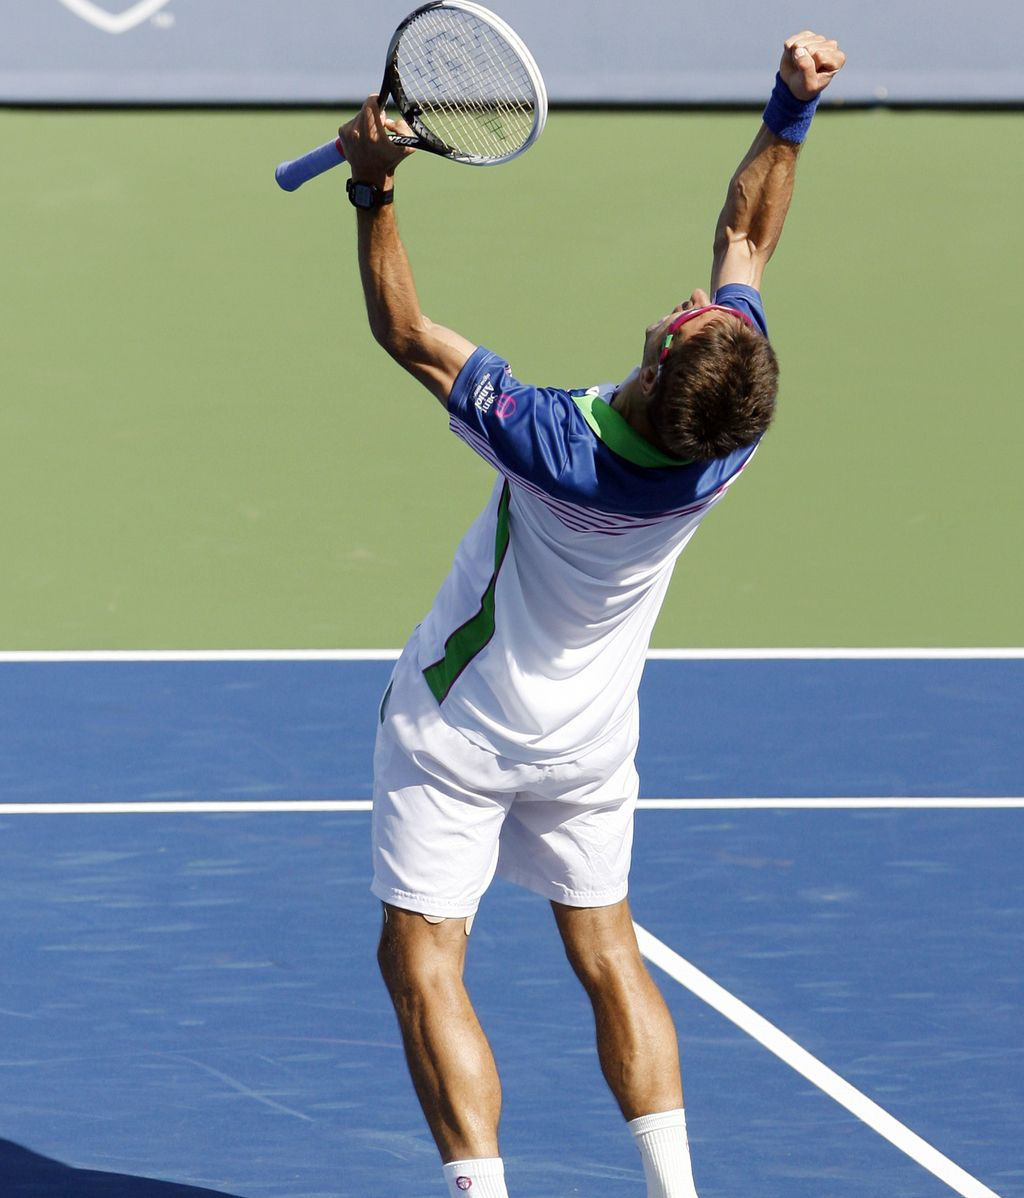 Robredo sorprende a Djokovic en Cincinnati